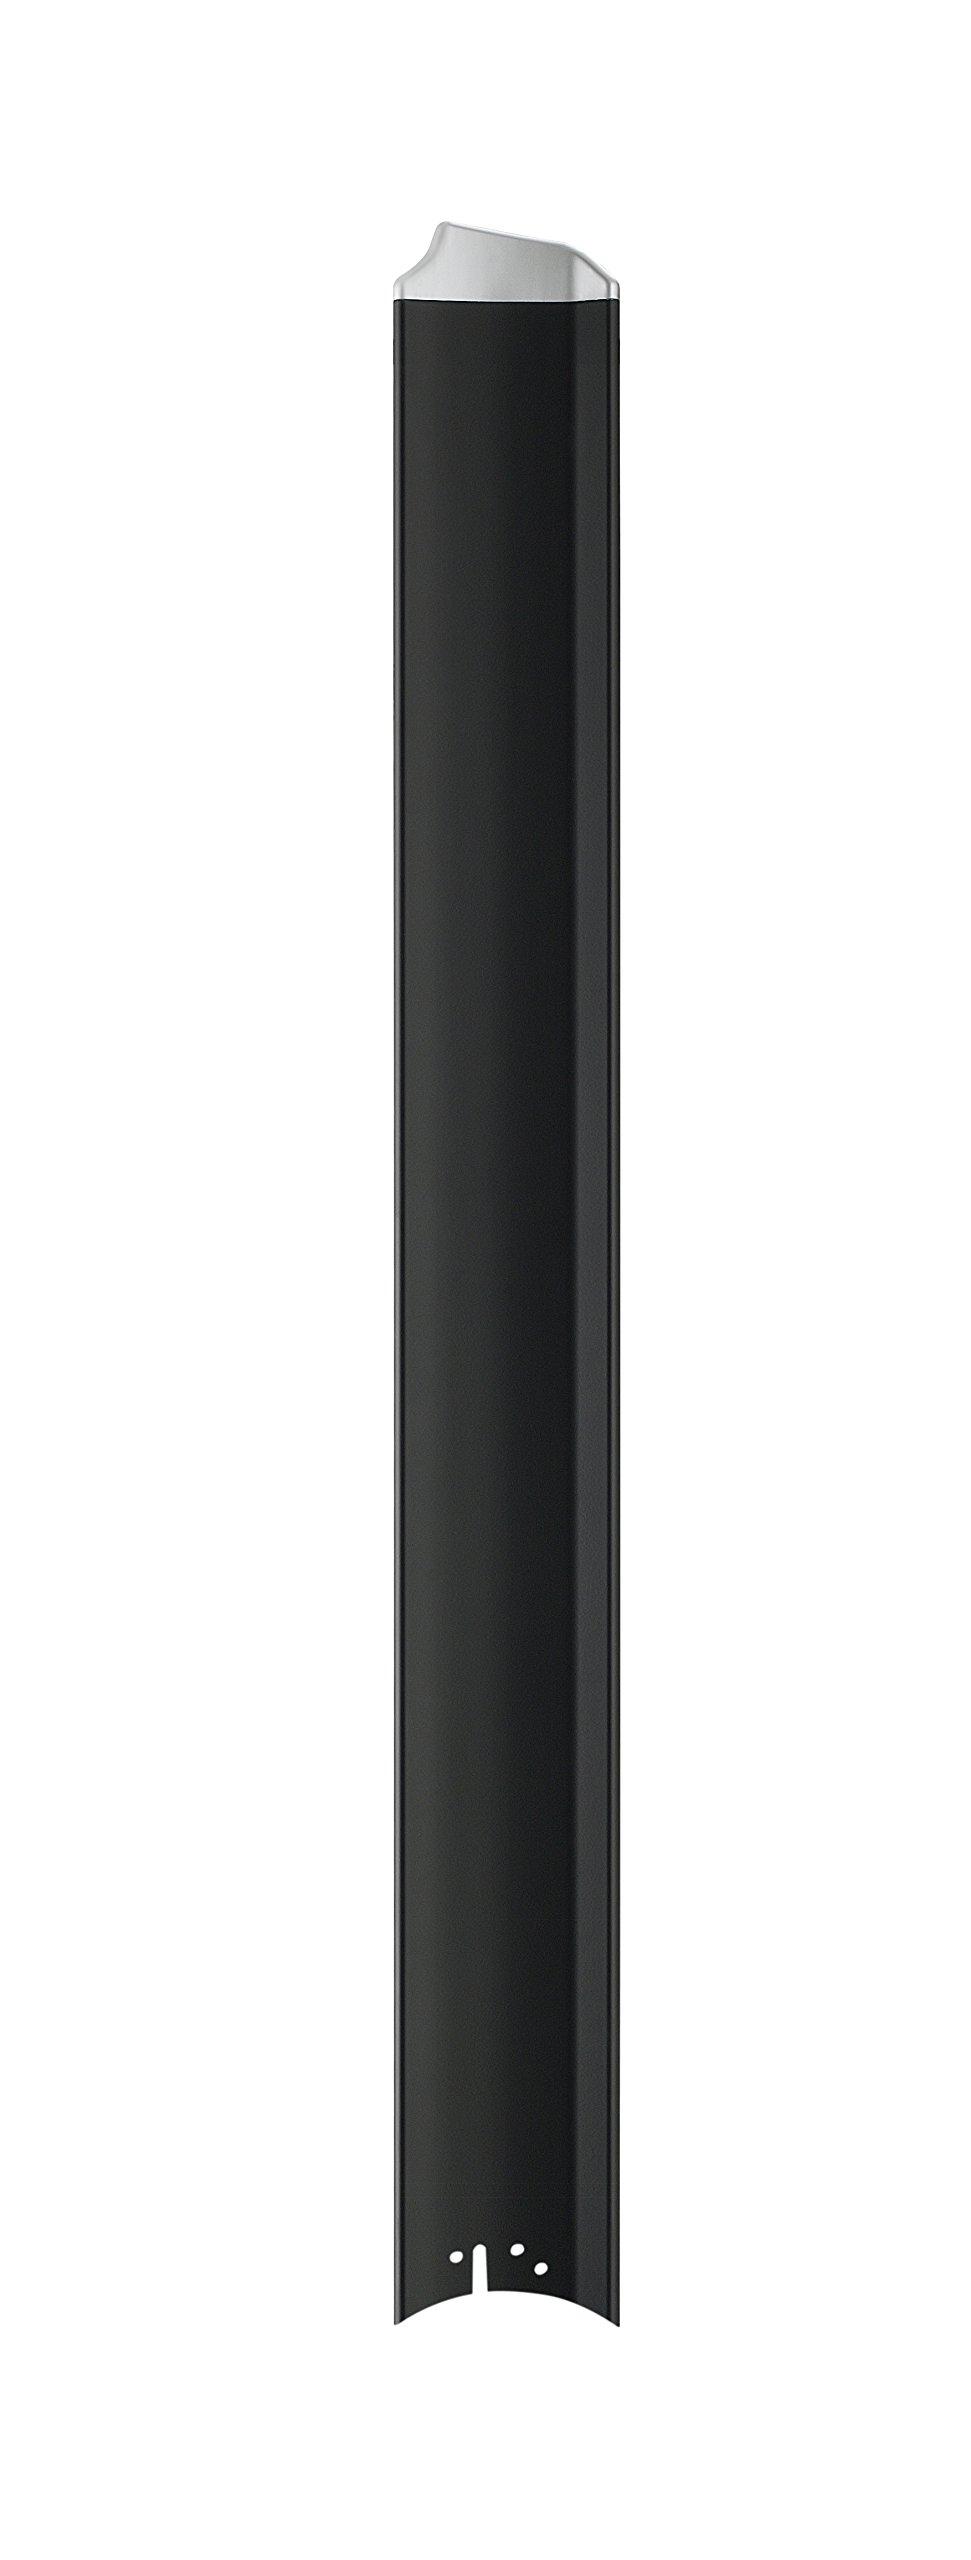 Fanimation B7997-64BLW Fan Blades, Black with Silver Tip